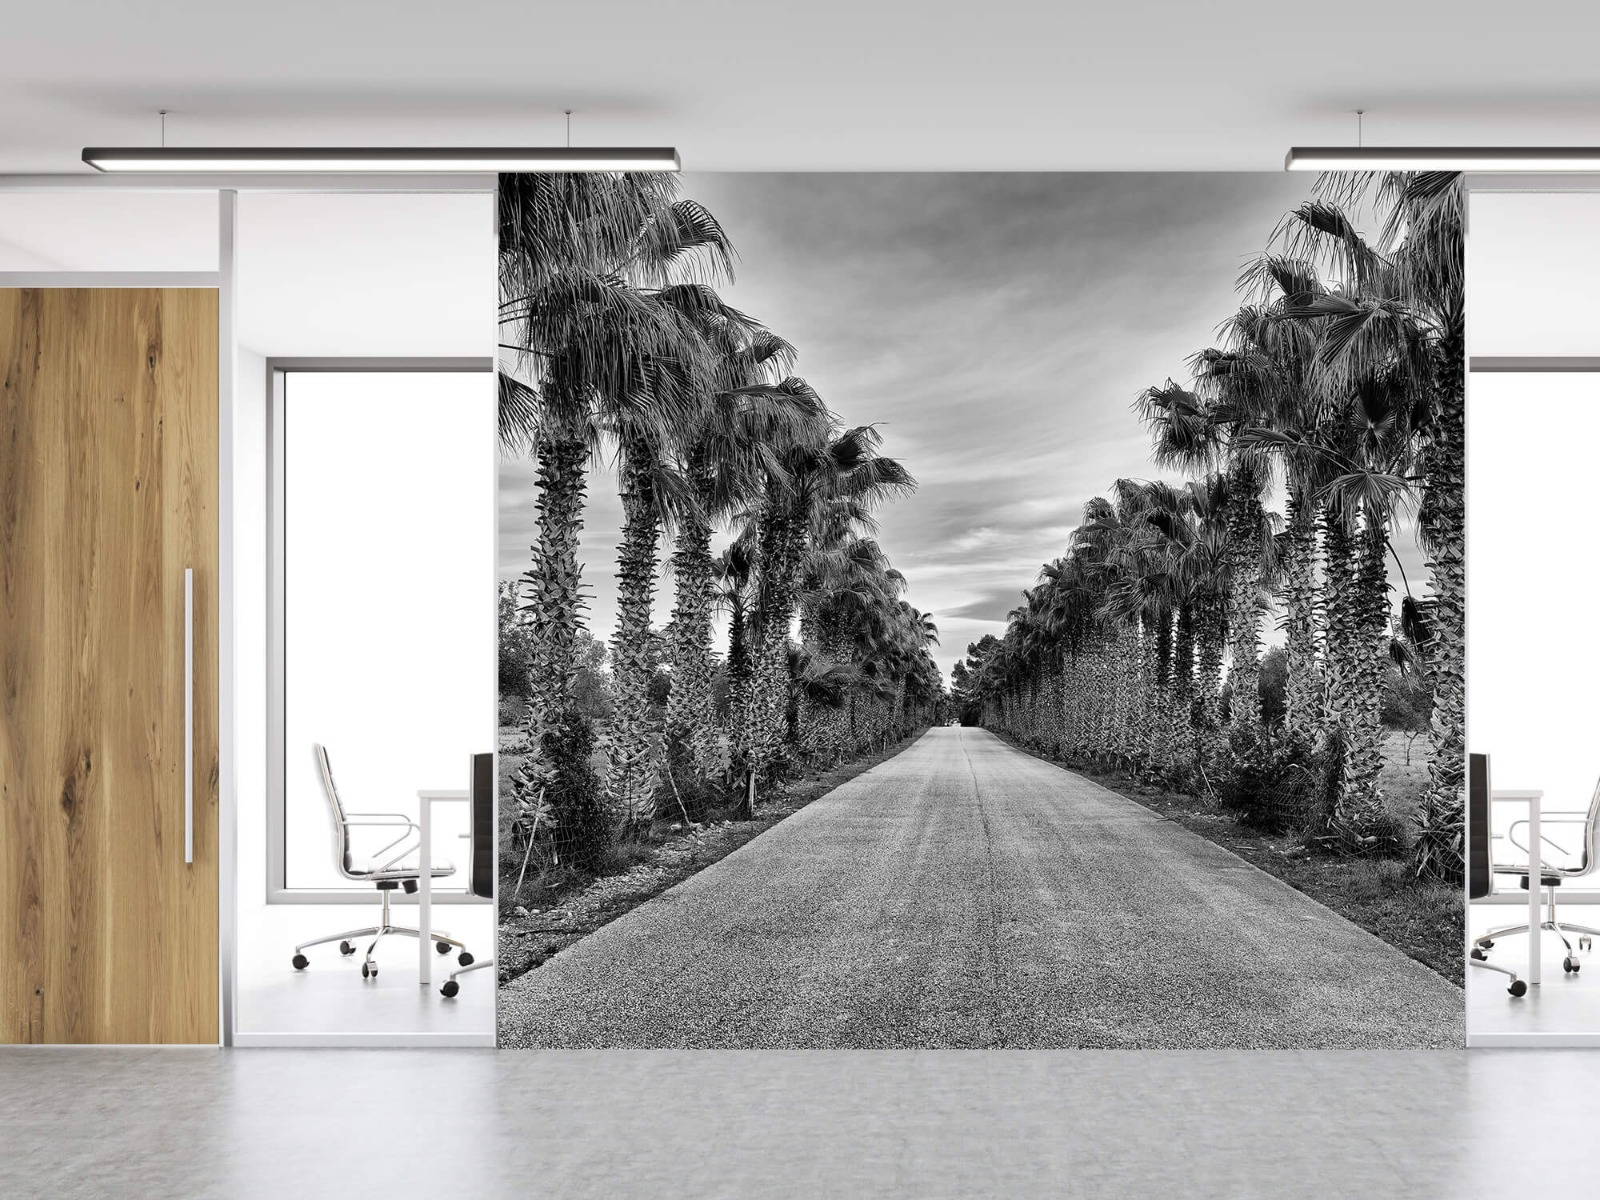 Palmbomen - Straat met palmbomen - Woonkamer 11